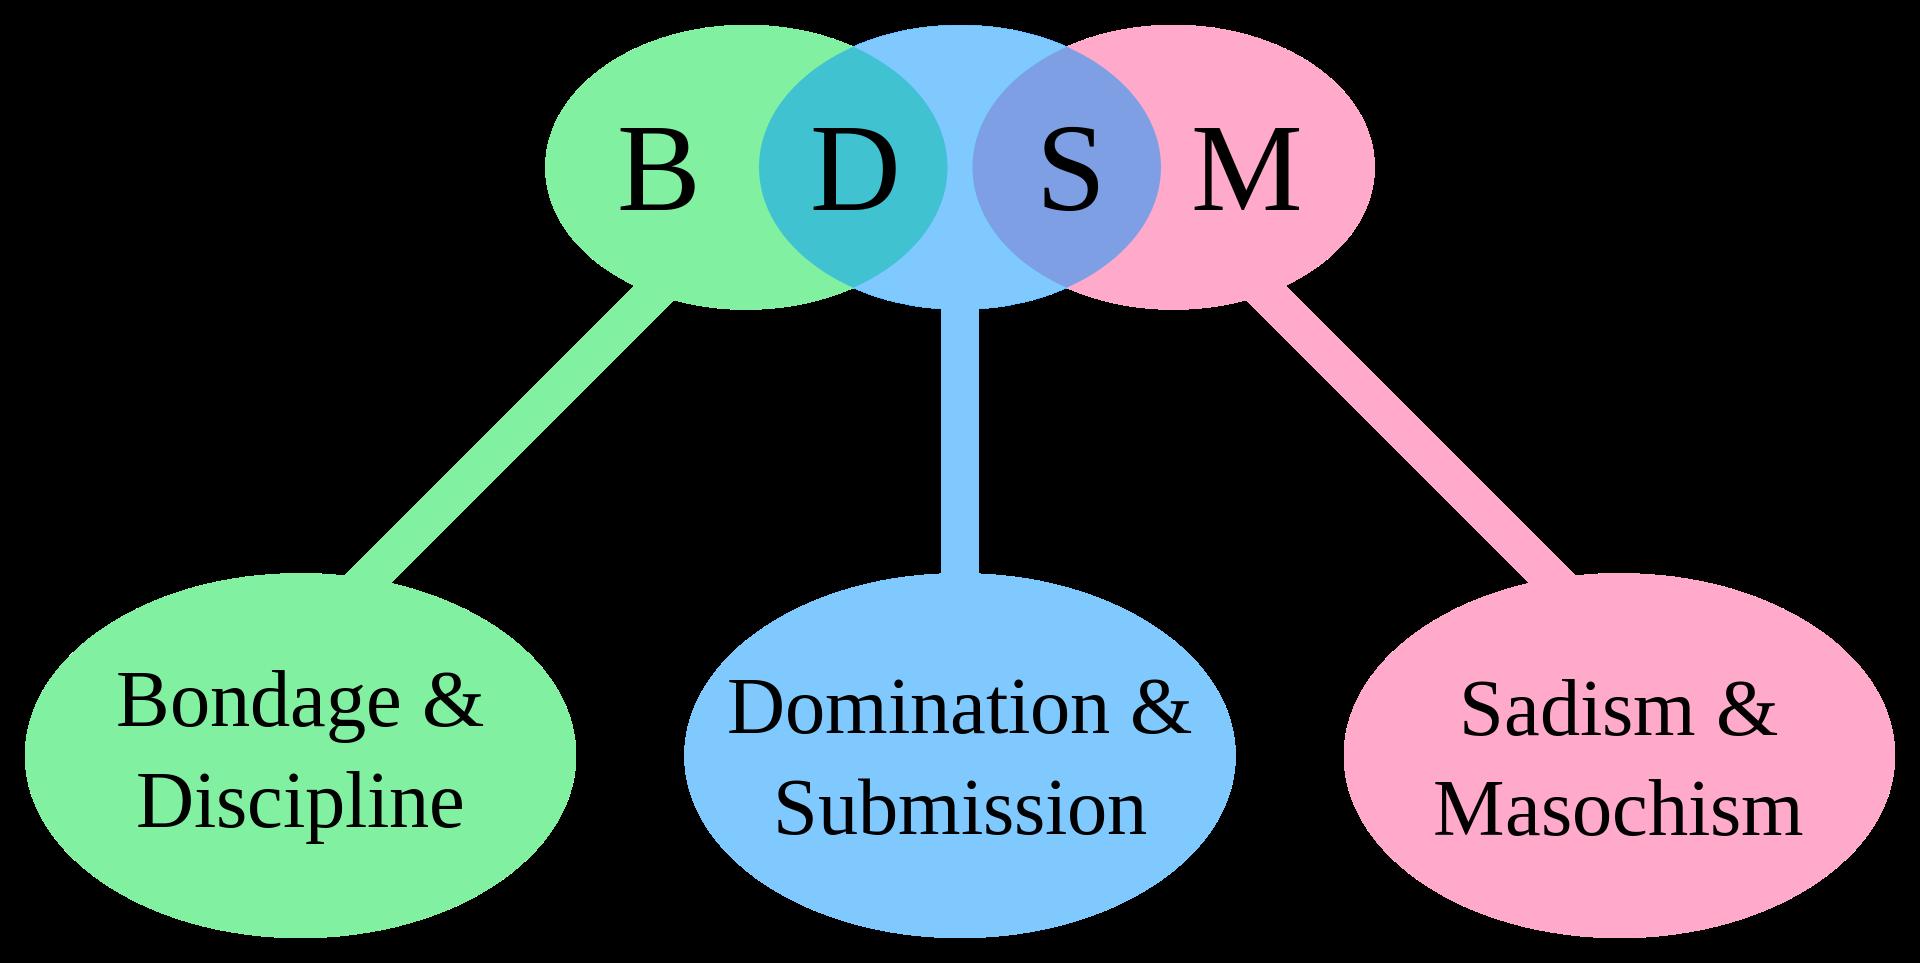 BDSM_acronym.svg.png